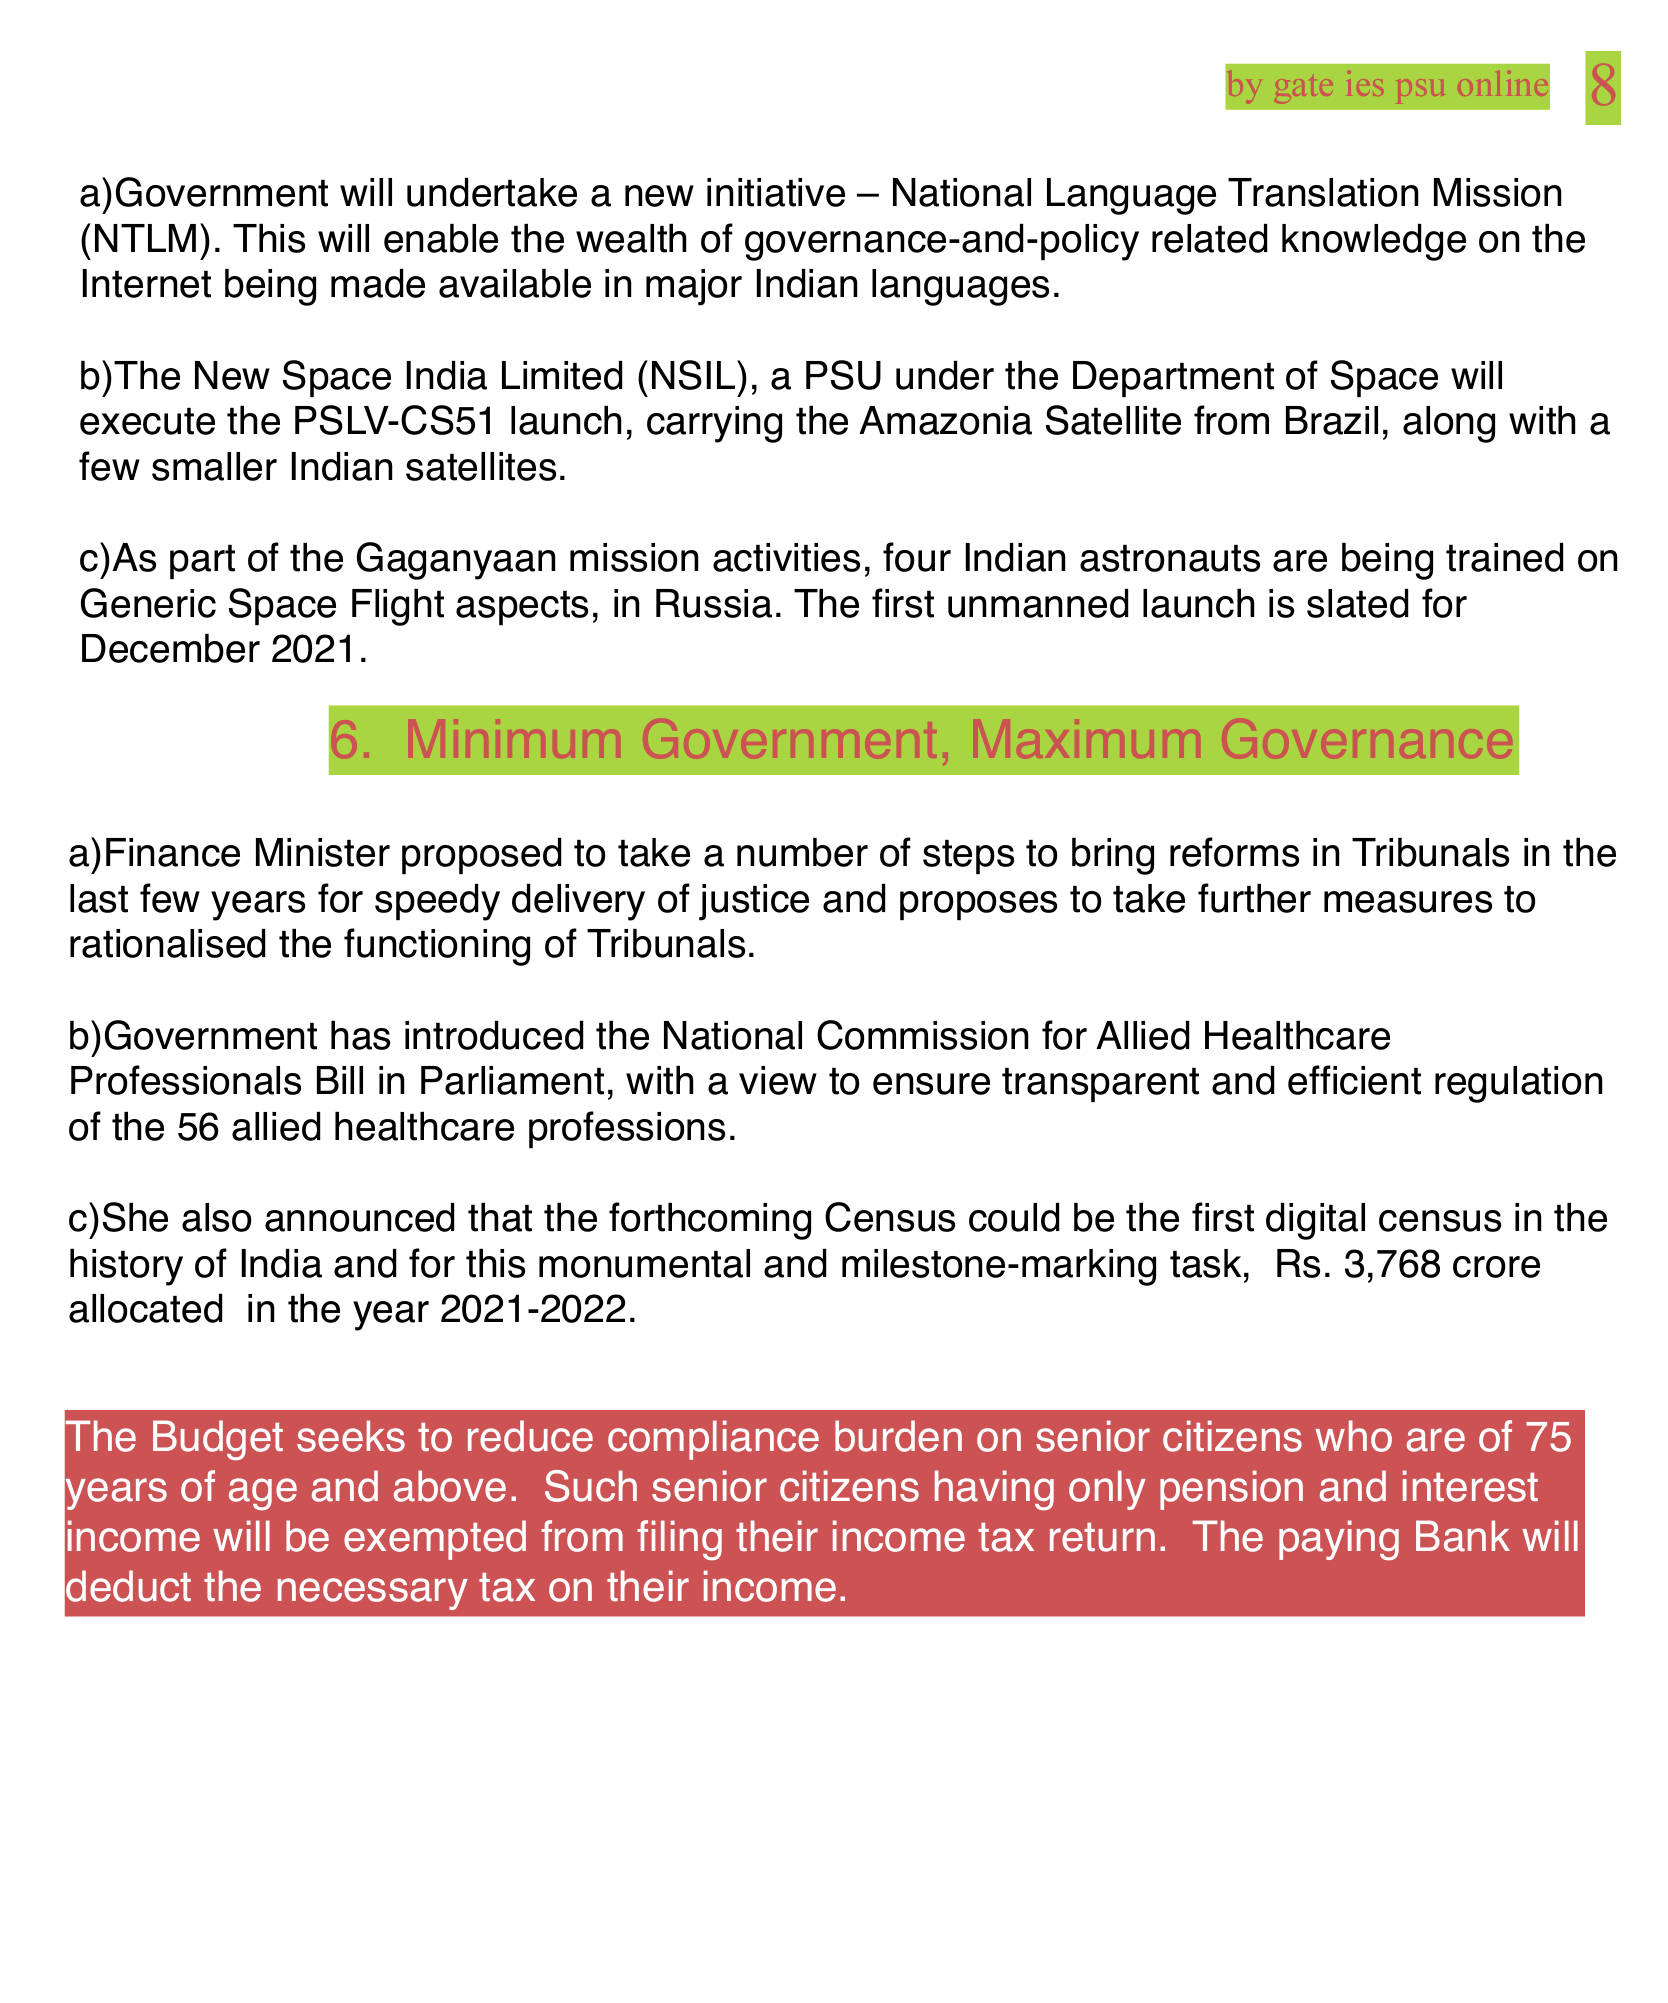 NTLM NATIONAL TRANSLATION MISSION, Digital census, UPSC CURRENT AFFAIRS